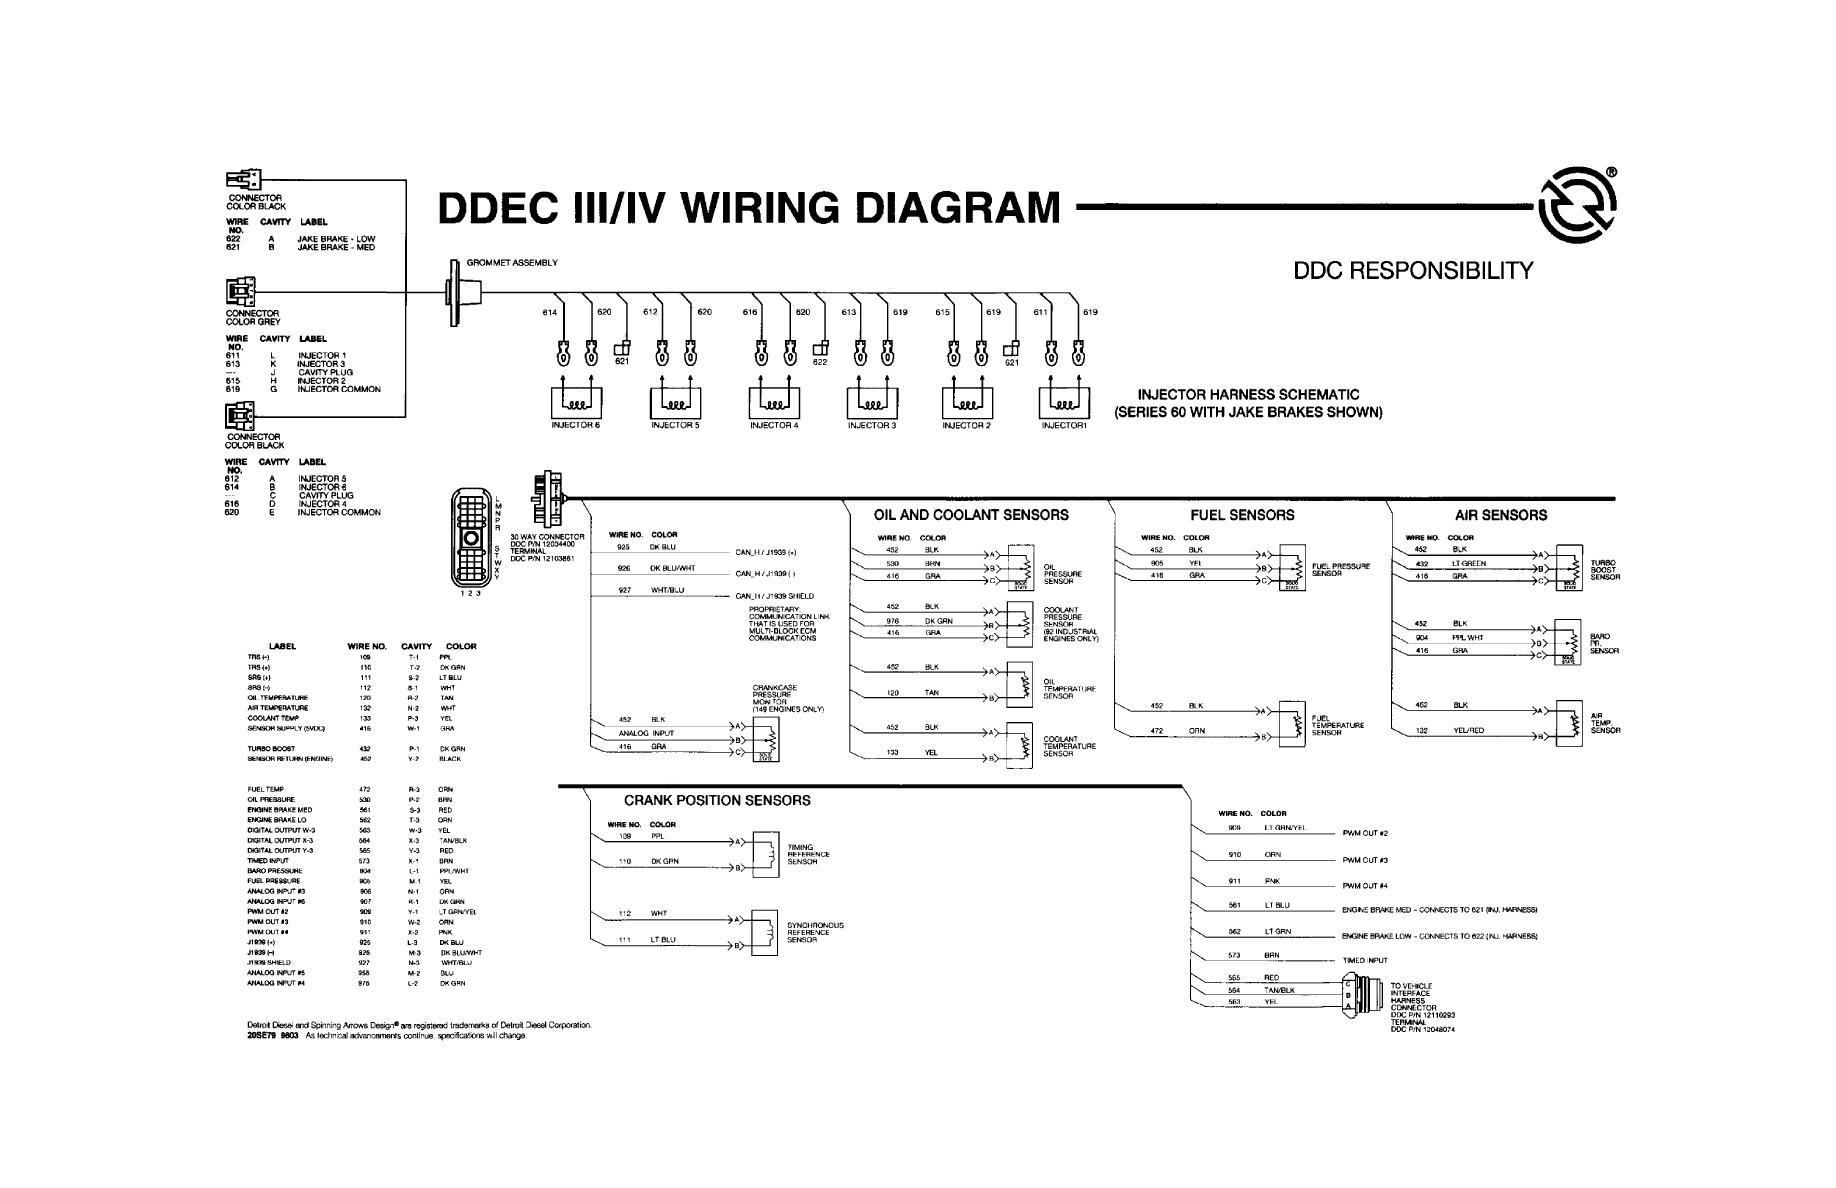 [DIAGRAM_4PO]  BC1C95 Detroit Diesel 60 Ecm Wiring Diagram Inputt | Wiring Library | Detroit Diesel 60 Ecm Wiring Diagram Input |  | Wiring Library